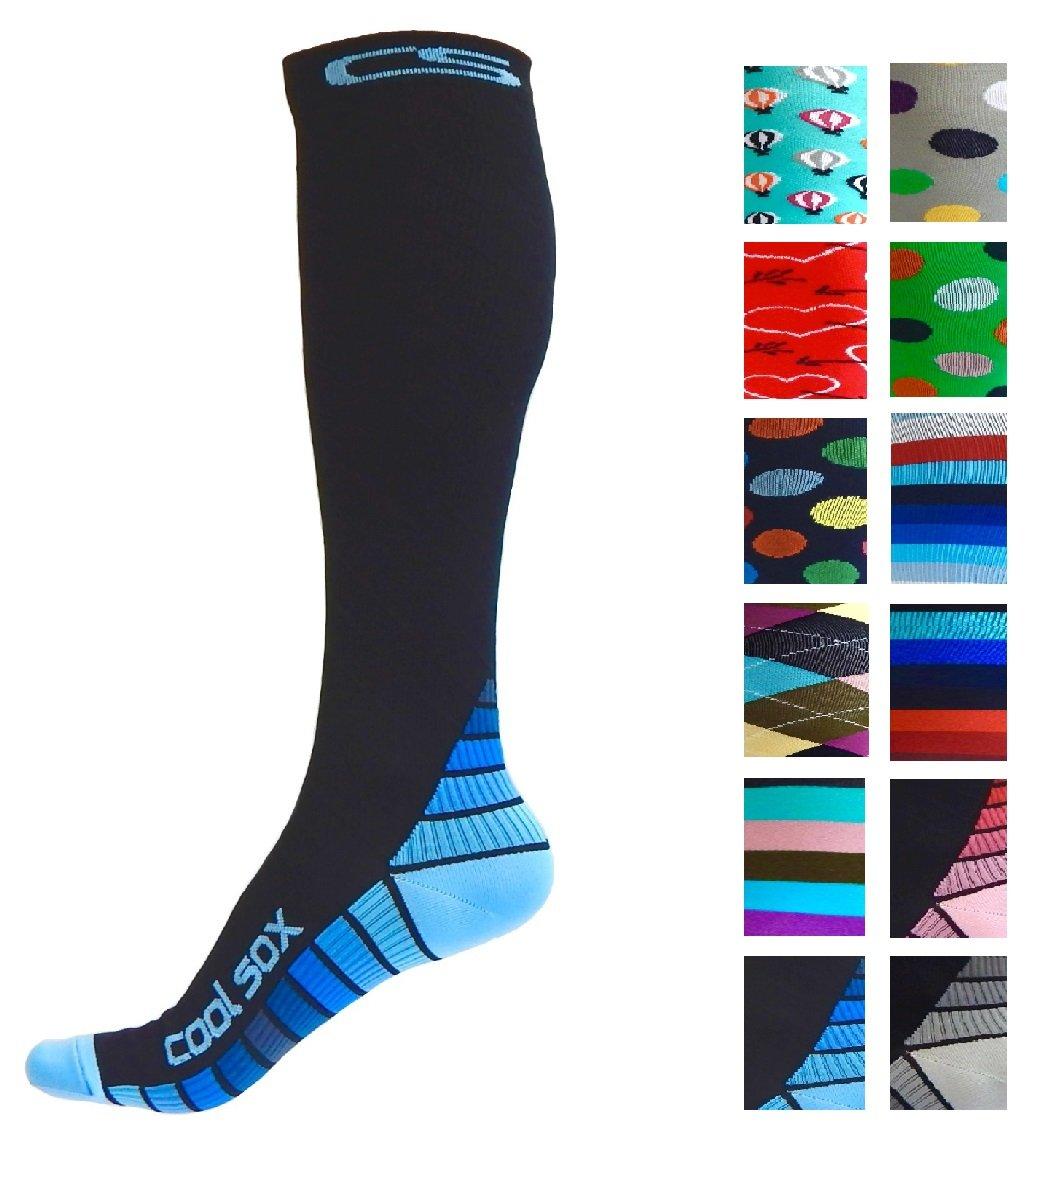 Compression Socks for Men & Women - Best Graduated Athletic Fit for Running, Nurses, Shin Splints, Flight Travel, Maternity Pregnancy - Boost Stamina, Circulation & Recovery (Black & Blue, S/M)